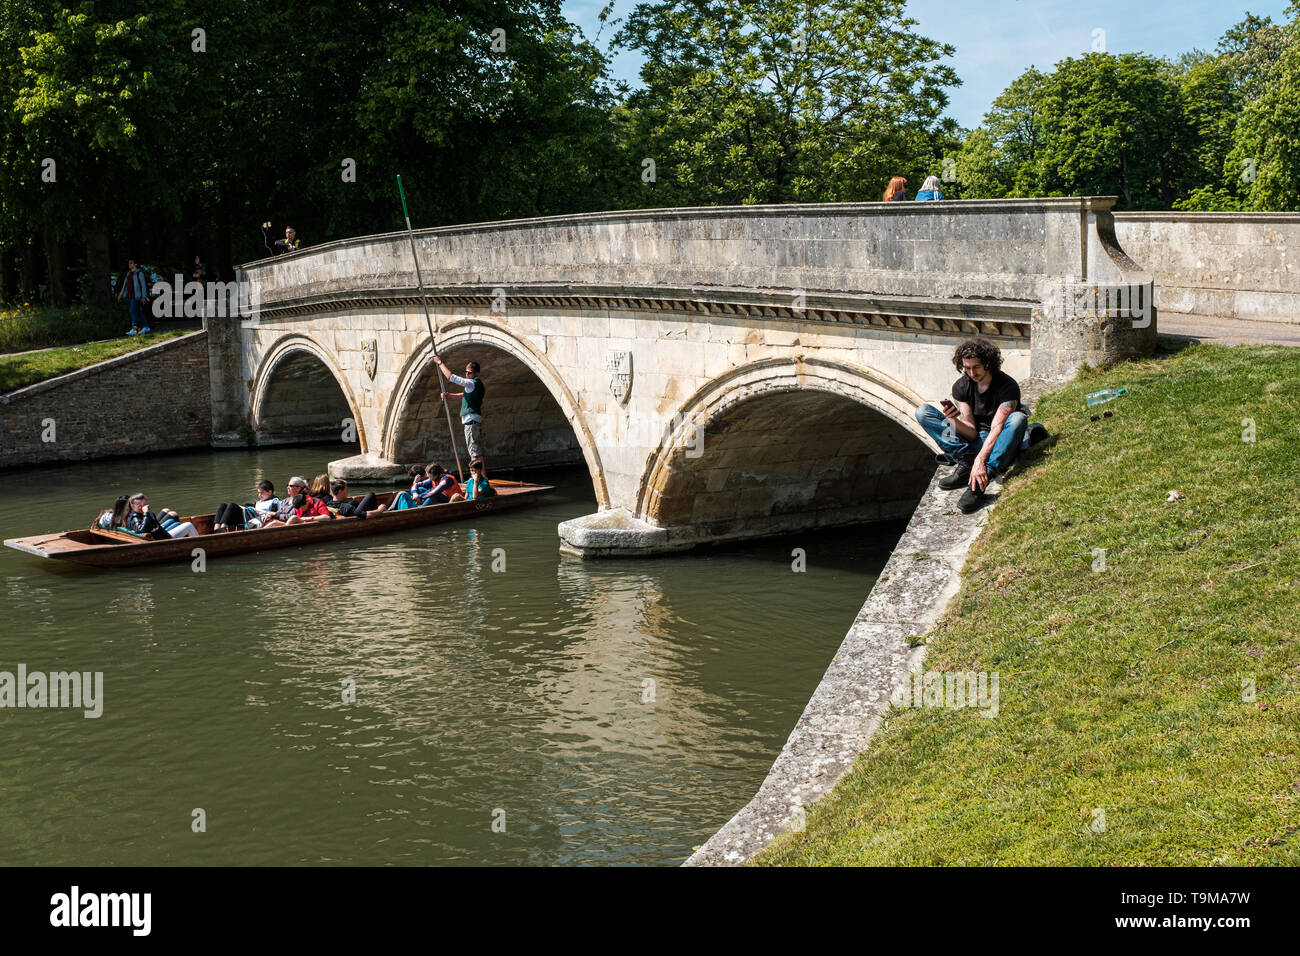 Students and tourists infront of University of Cambridge Trinity College Bridge. - Stock Image